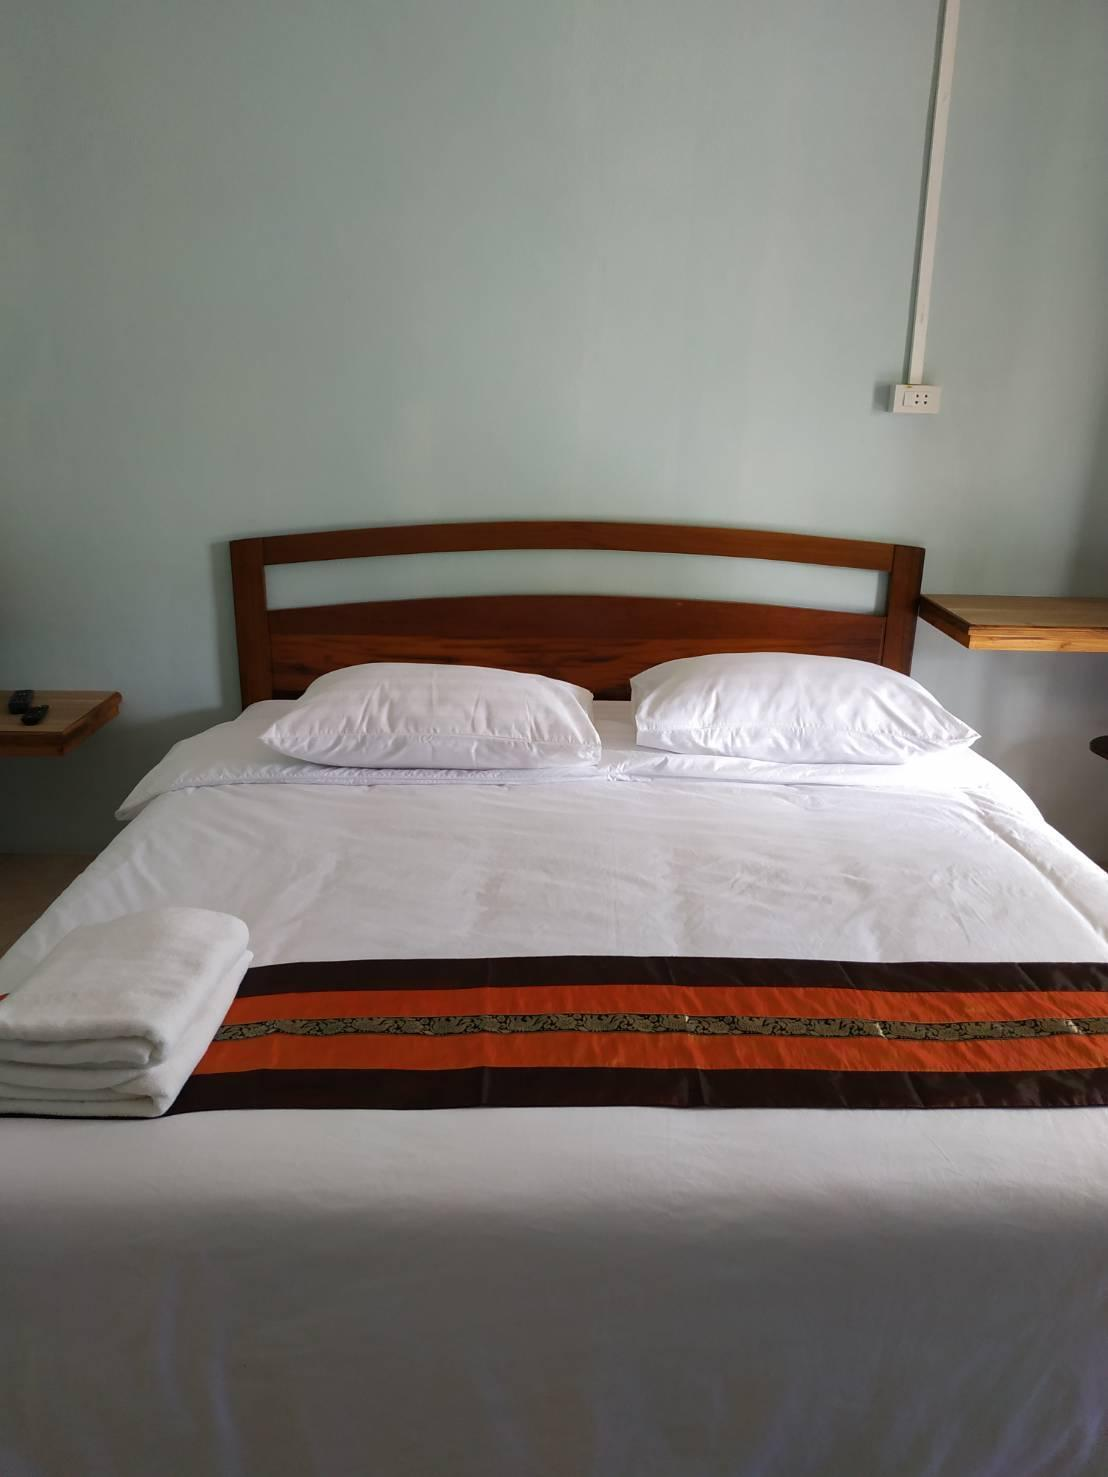 Piamsuk Resort เปี่ยมสุขรีสอร์ต